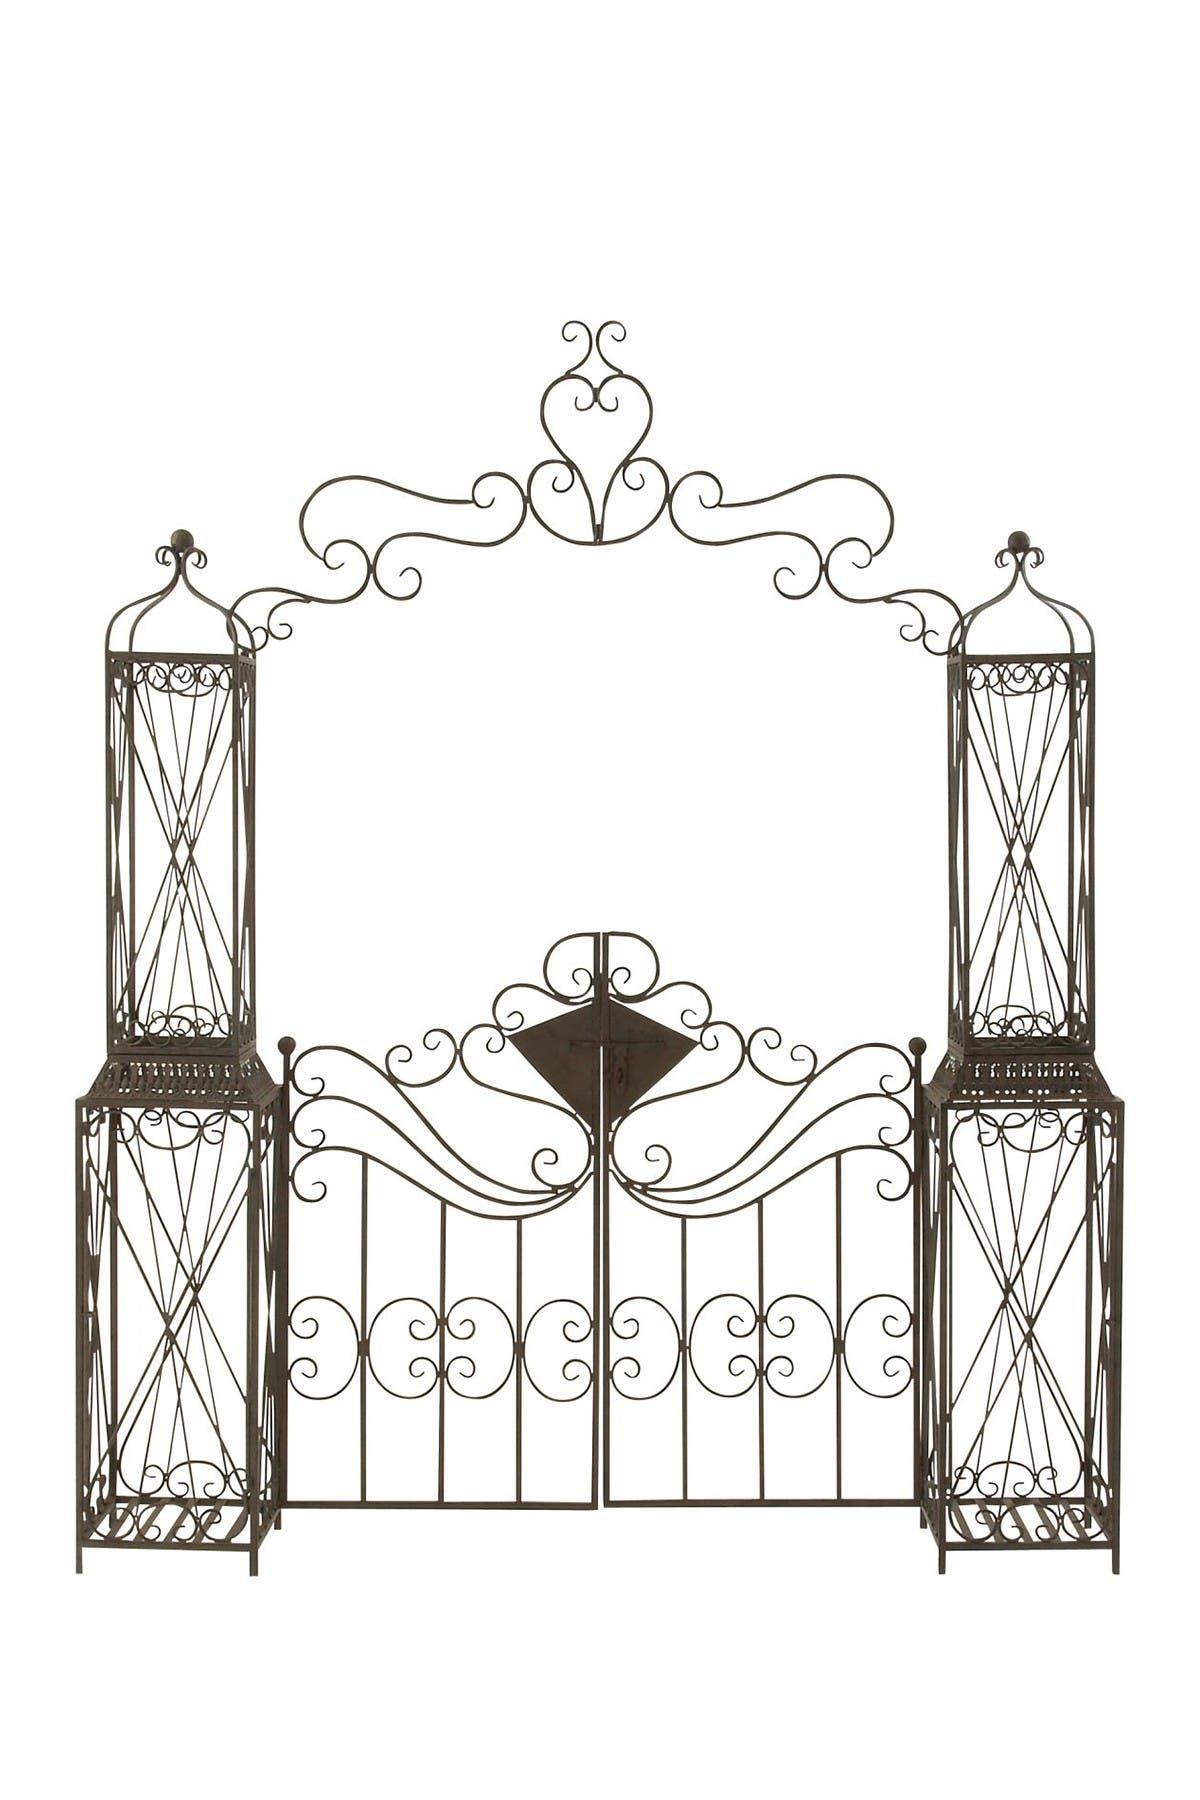 Image of Willow Row Metal Garden Gate